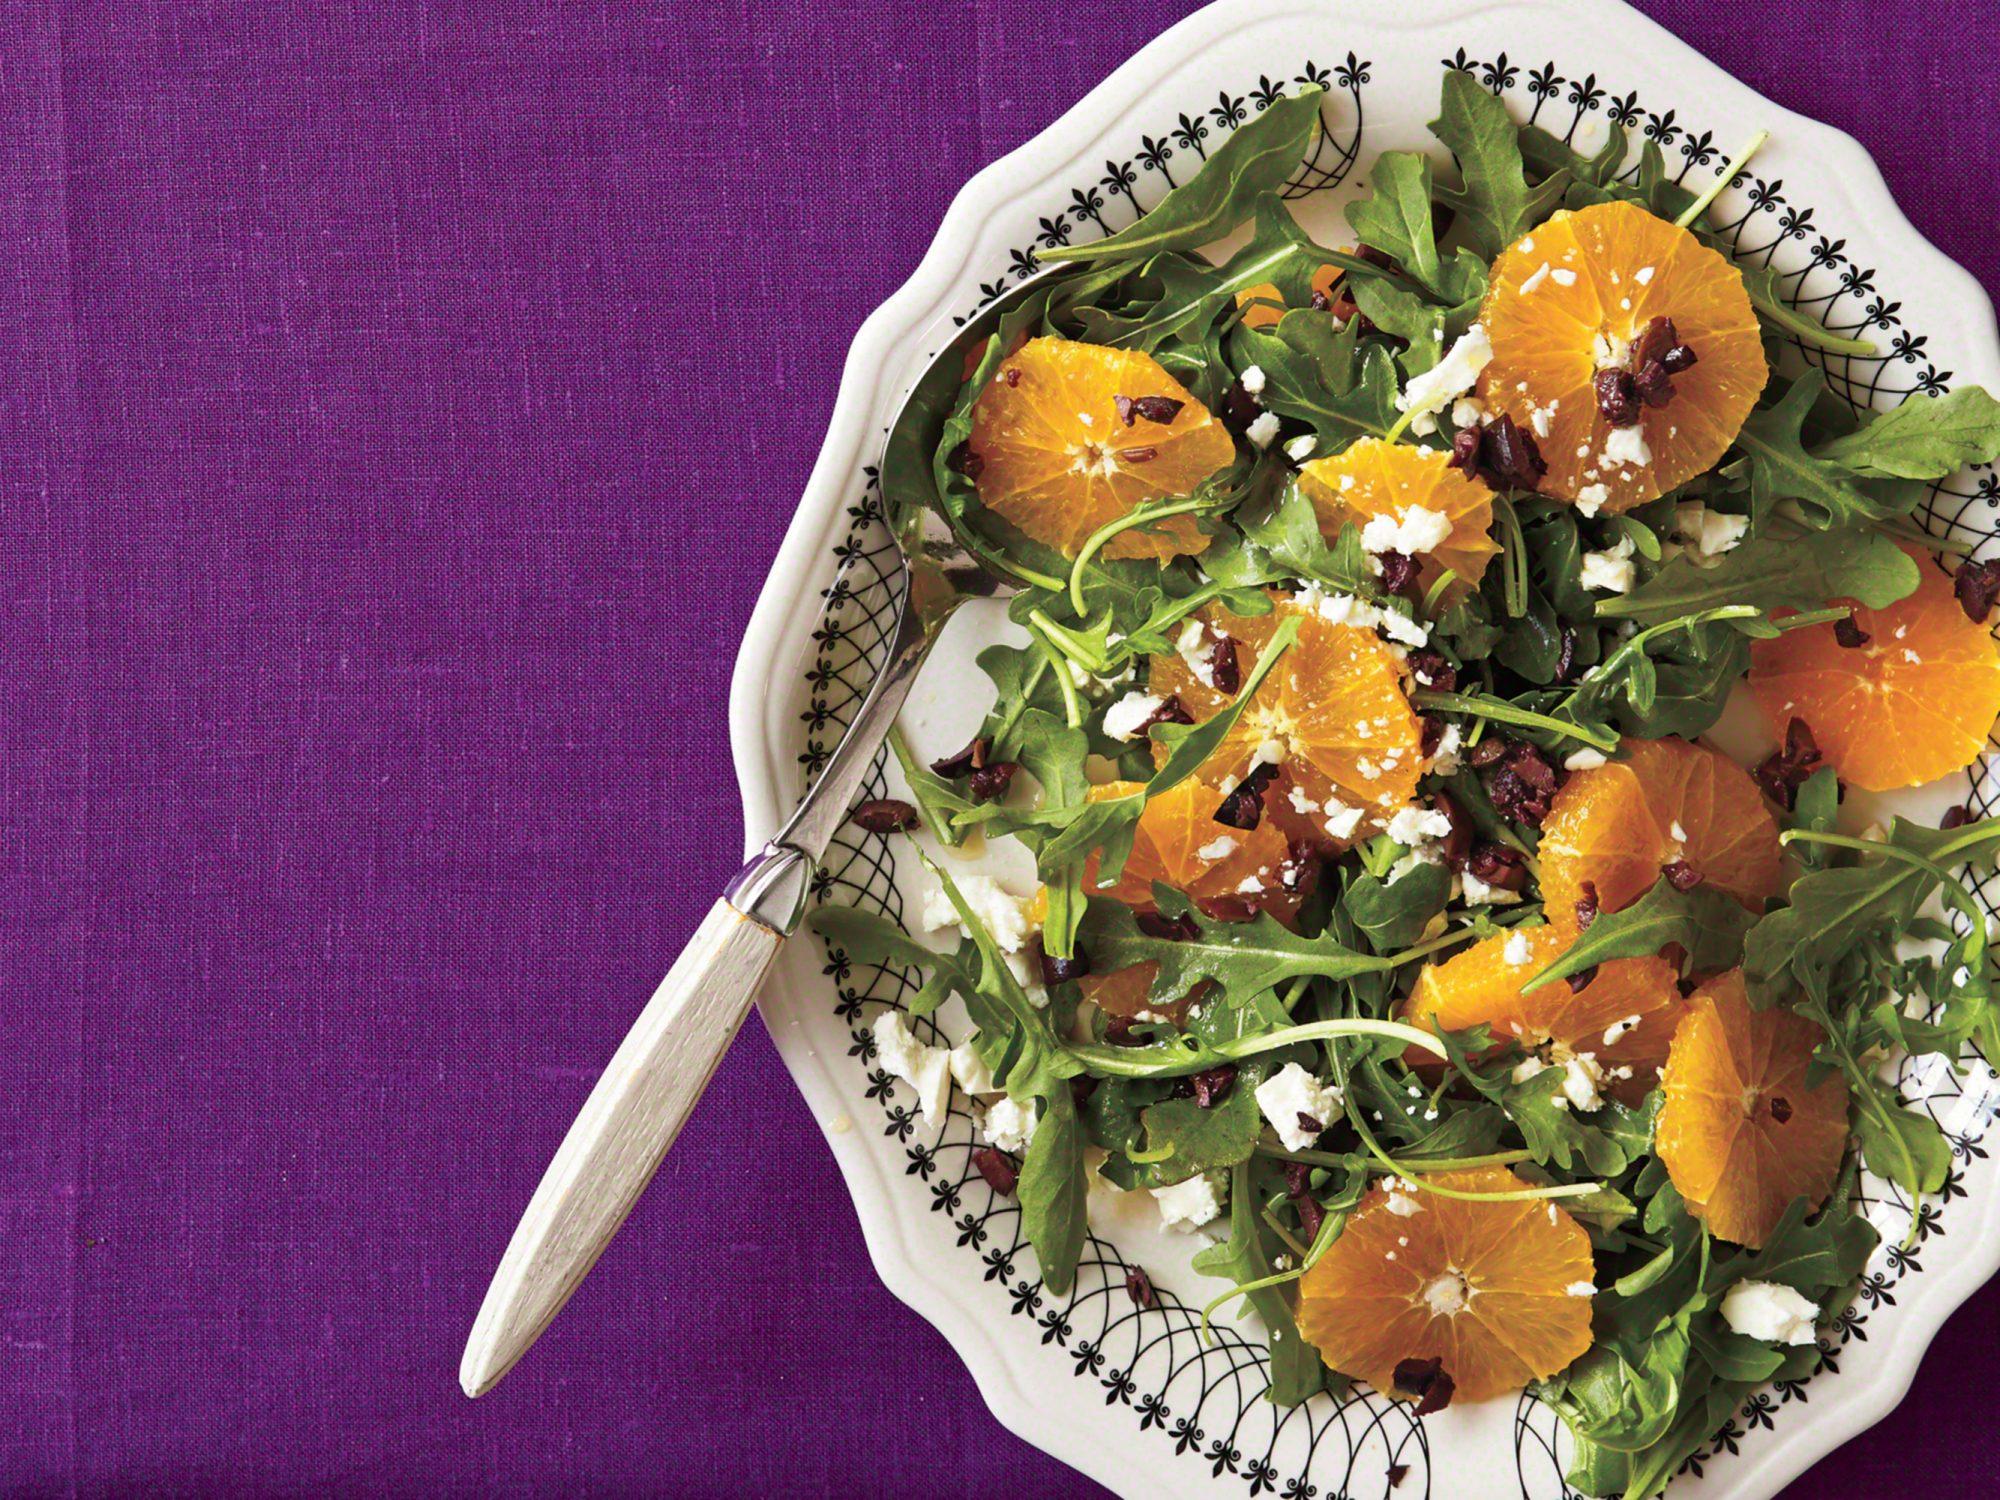 ay-Orange-and-Black Salad Platter